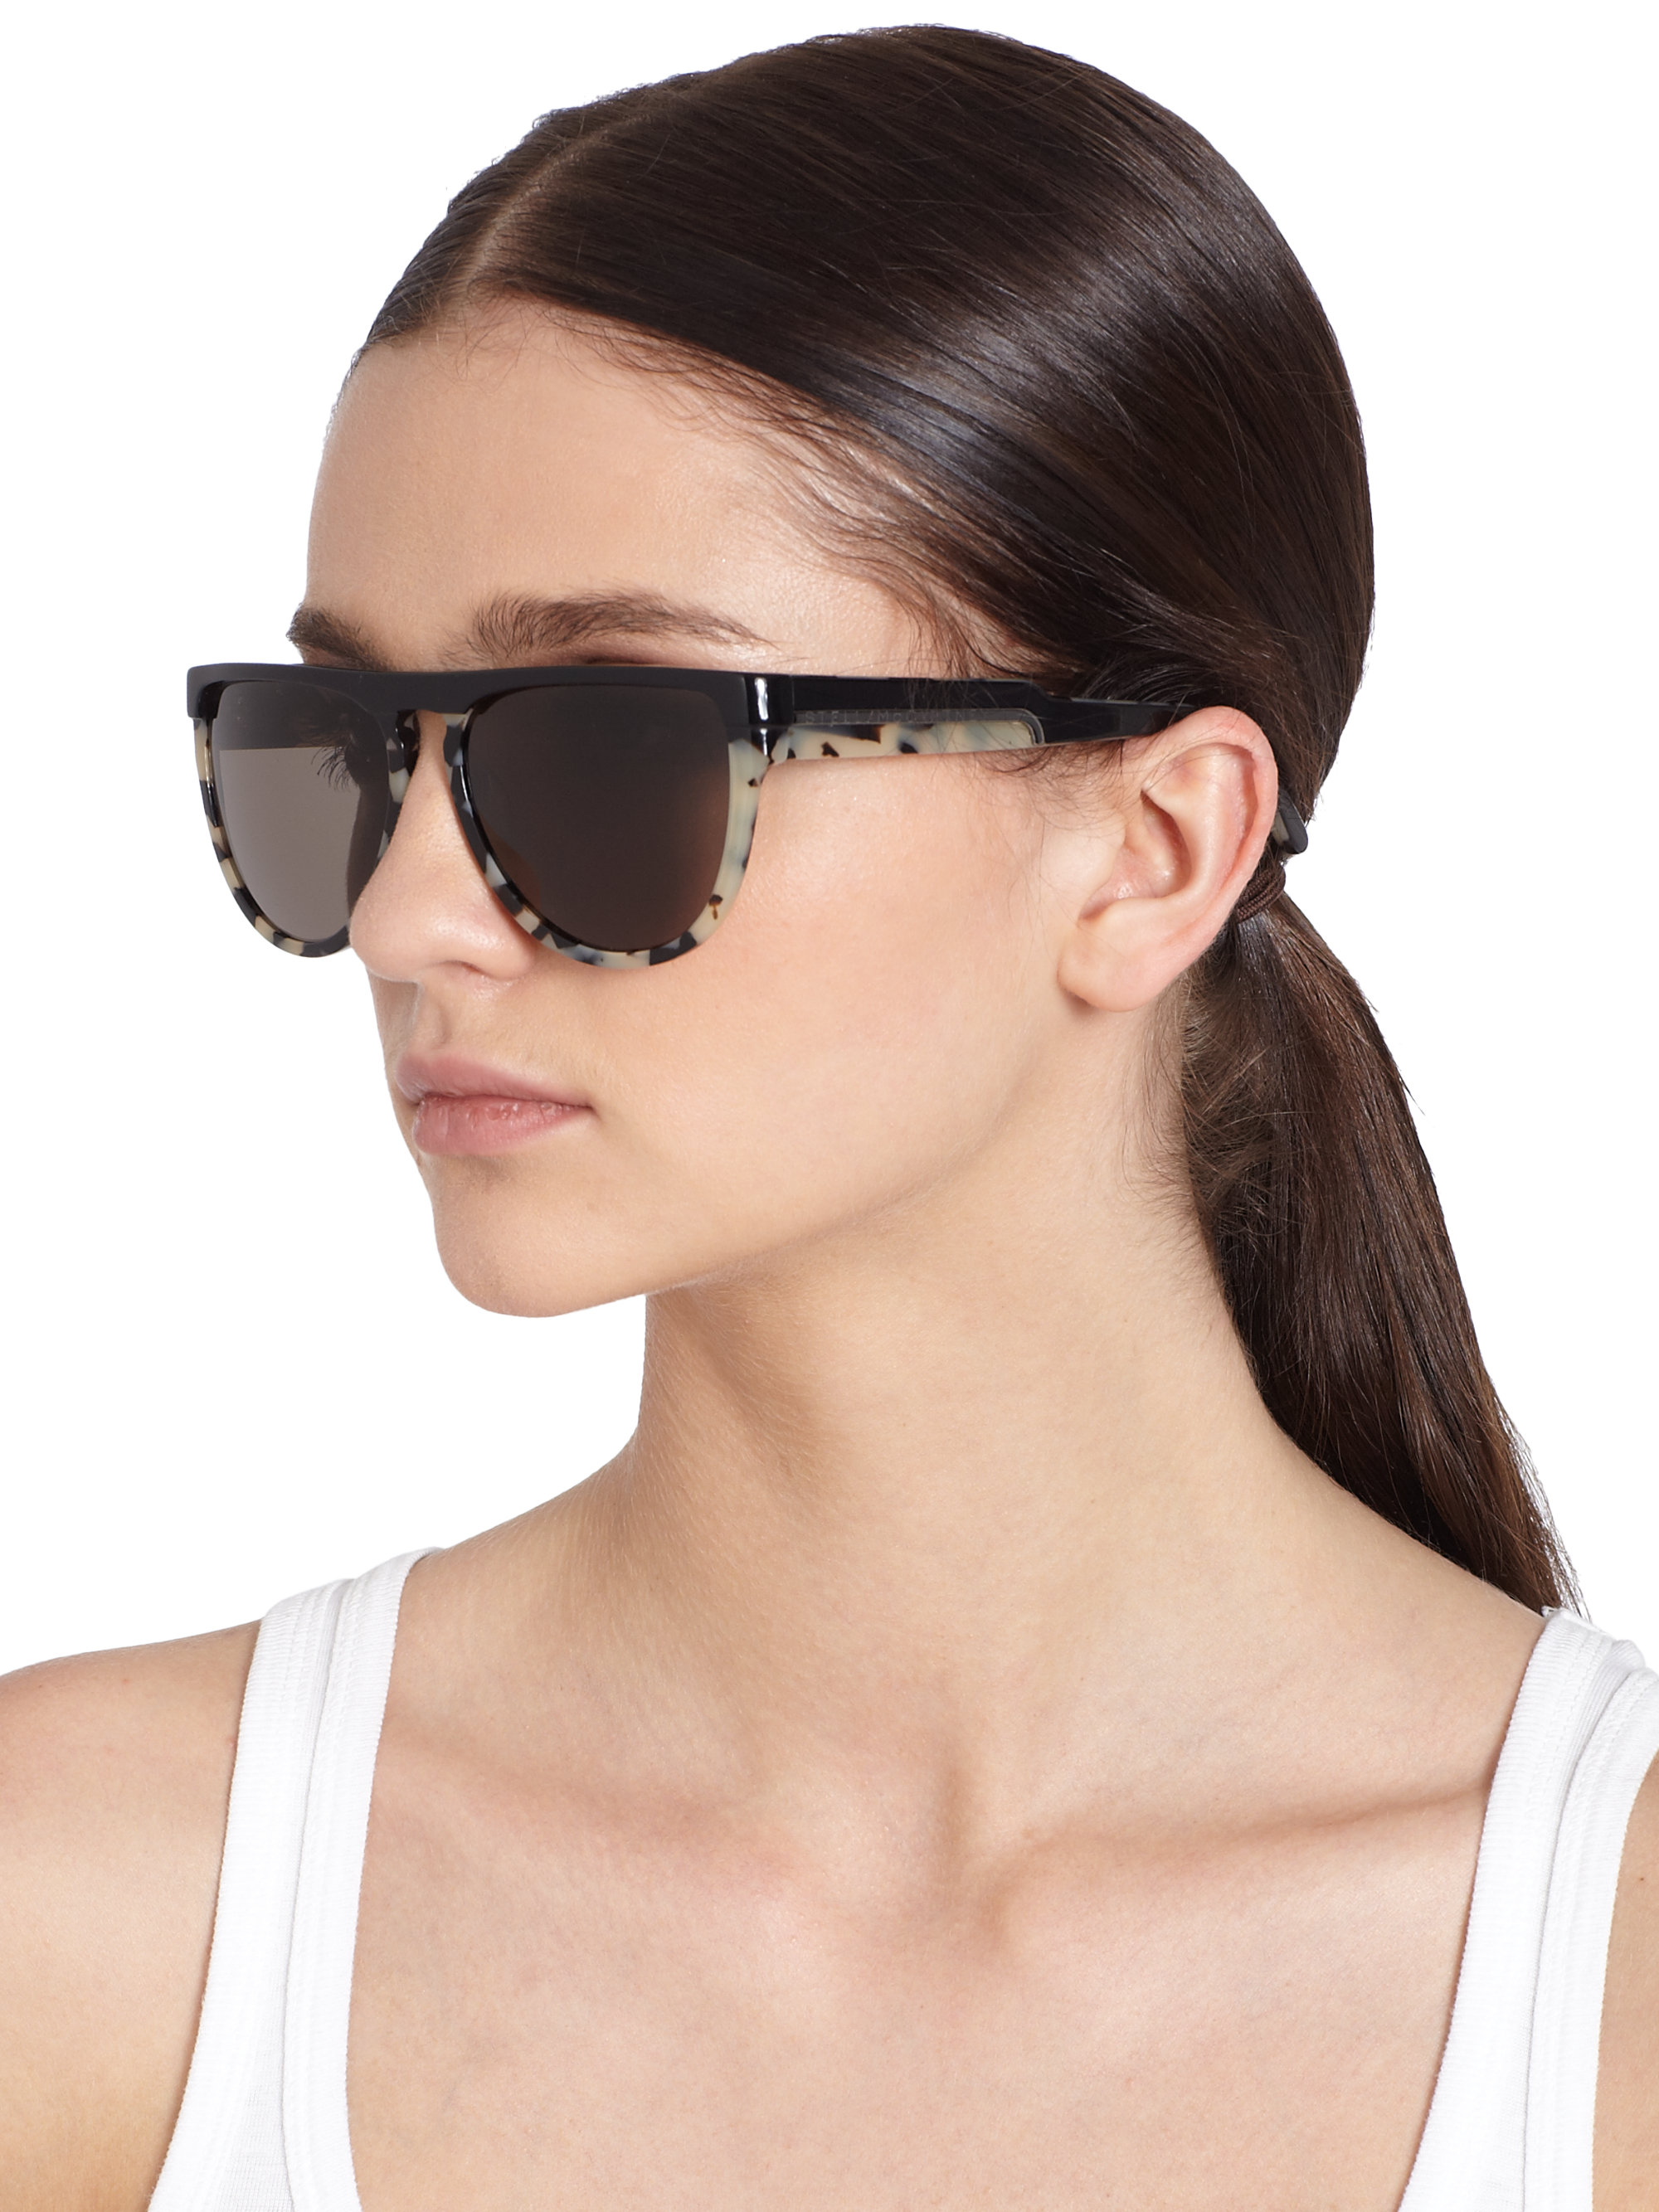 66cad3e187e9d Stella McCartney Oversized Round Acetate Sunglasses in Gray - Lyst